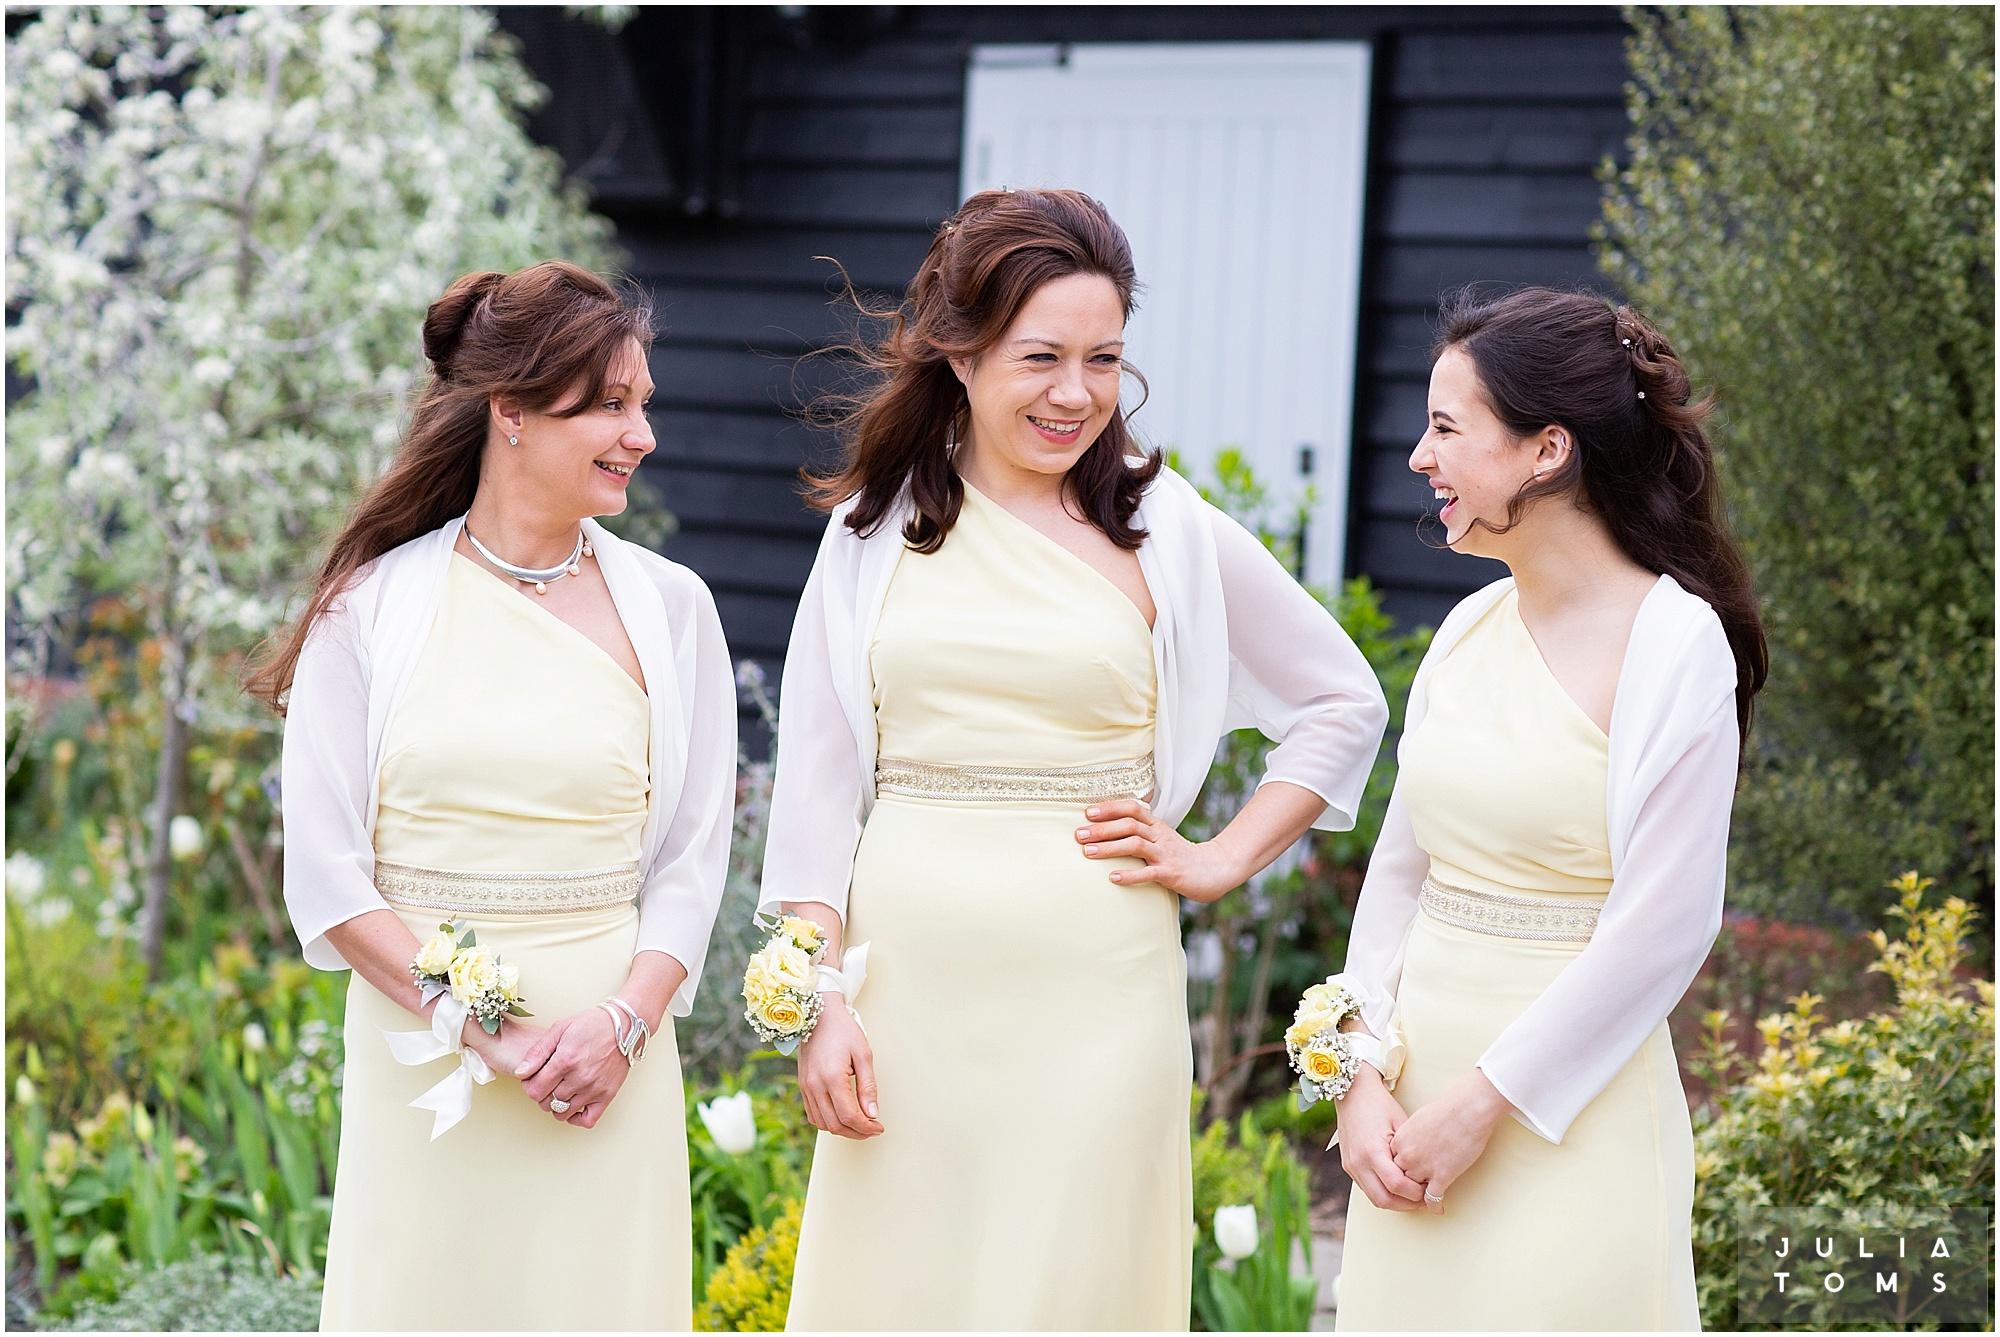 farbridge_barn_wedding_photographer_chichester_012.jpg